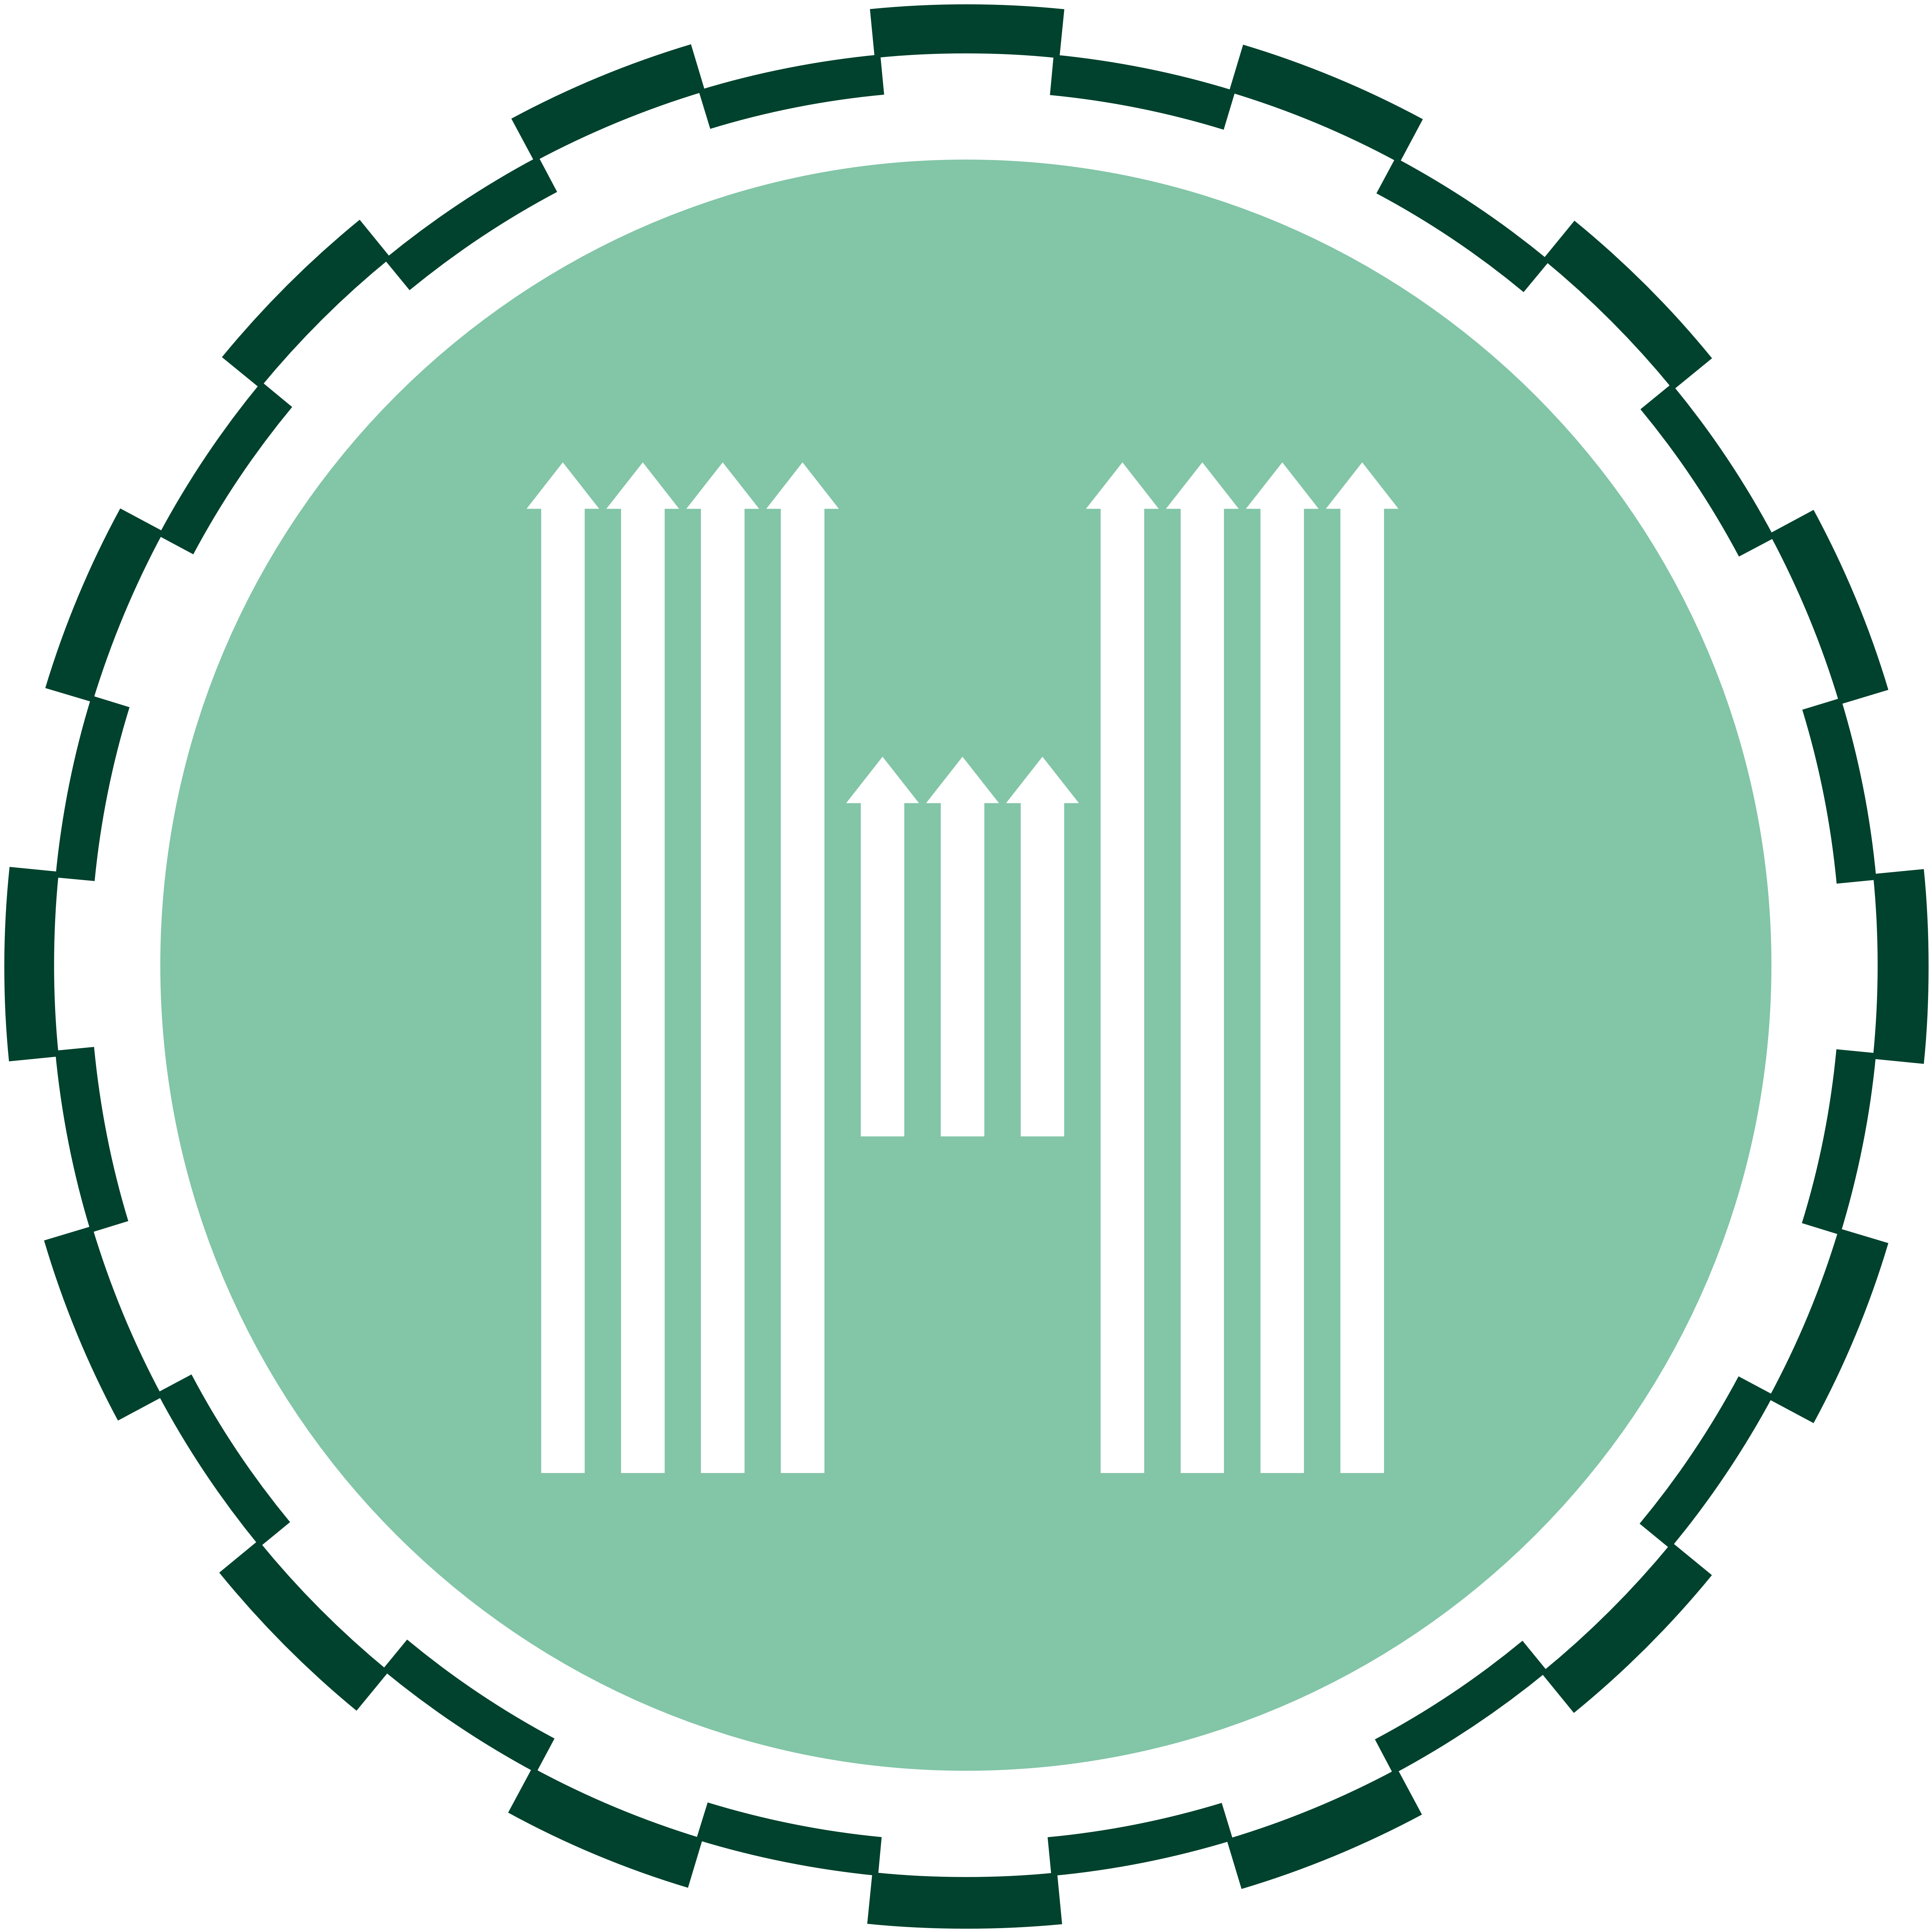 Henderson Investment logo, emblem, logotype